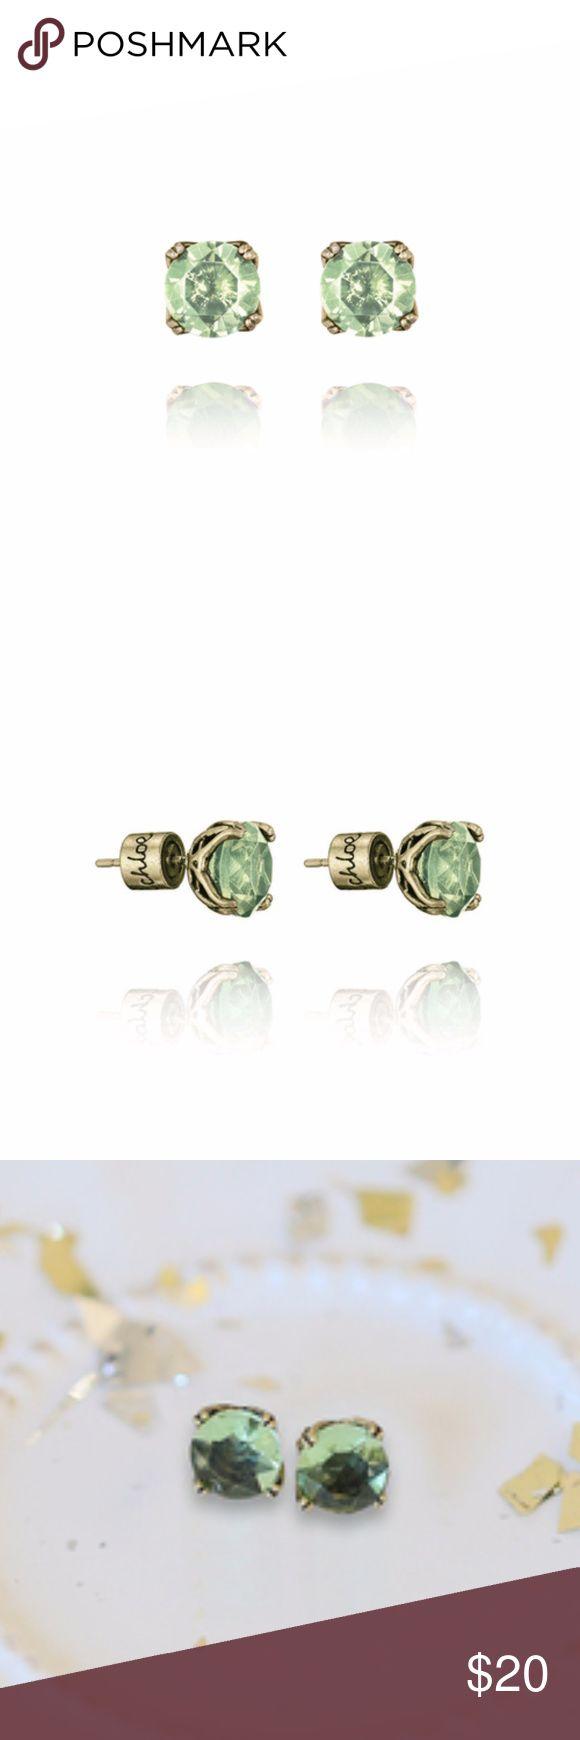 "Round Peridot Birthstone Stud Earrings Peridot is the birthstone of August!   antique brass-plated nickel-free plating 0.25"" approx. width stainless steel post peridot glass  NEVER WORN! Chloe + Isabel Jewelry Earrings"